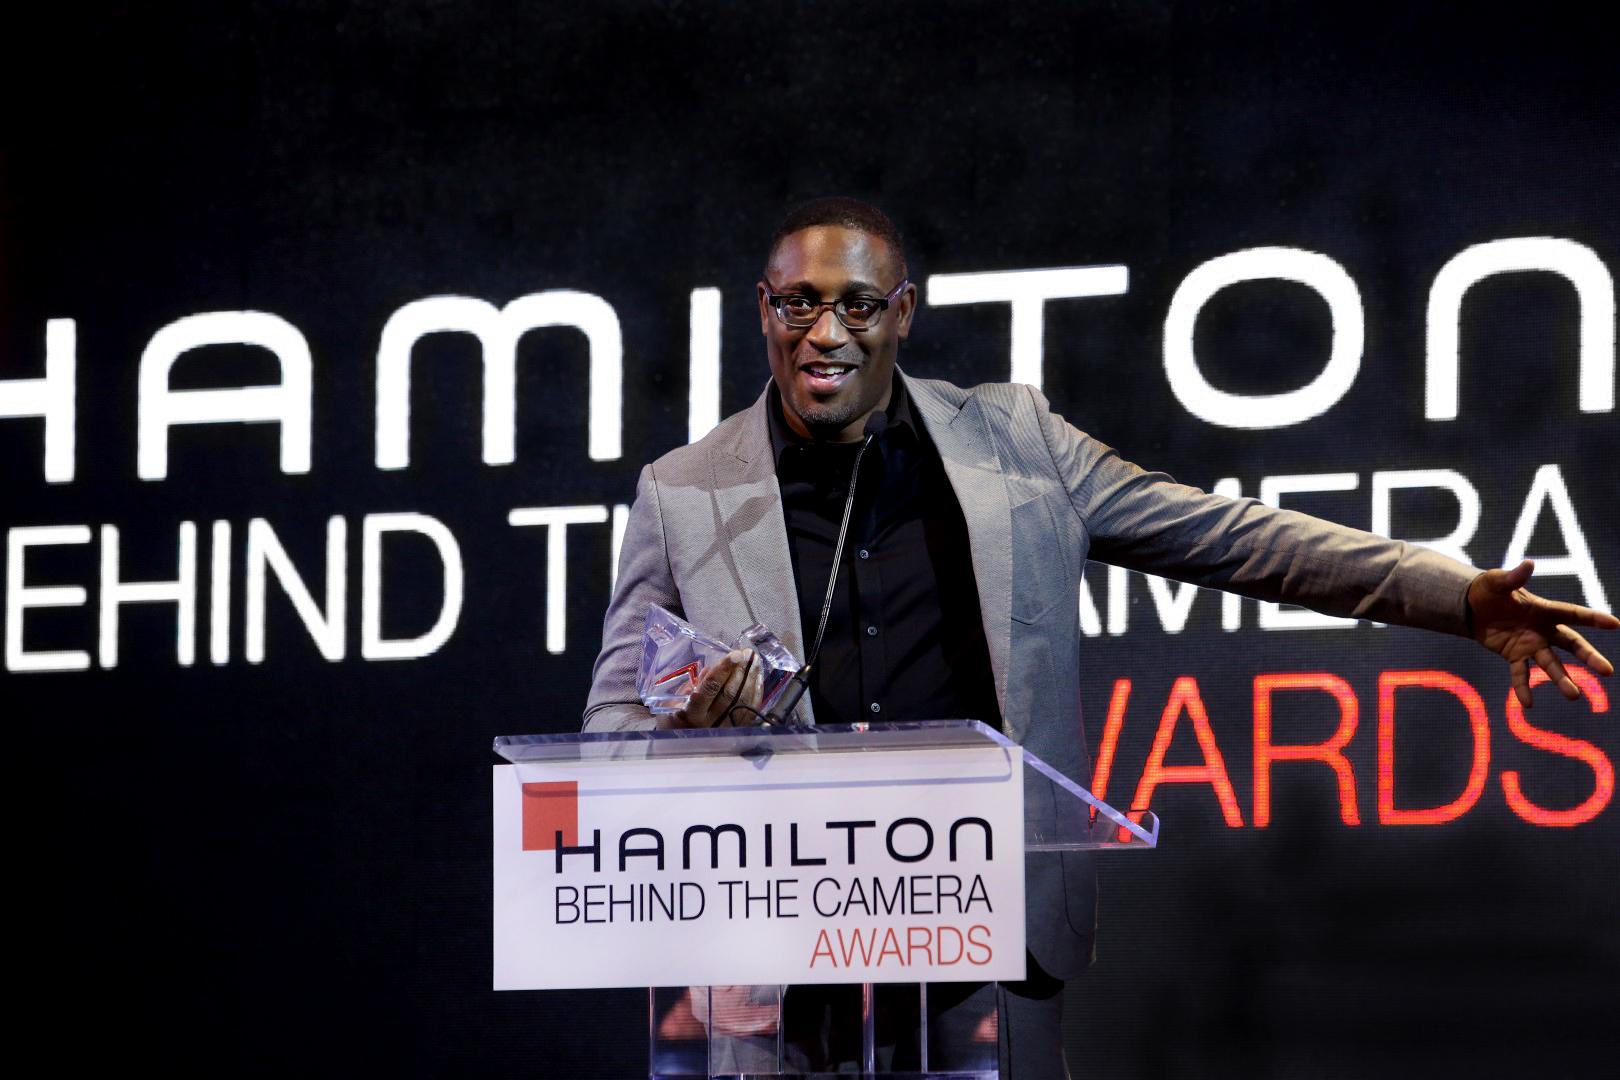 Hamilton Behind the Camera Awards 2018 - George Tillmann Jr - On stage.